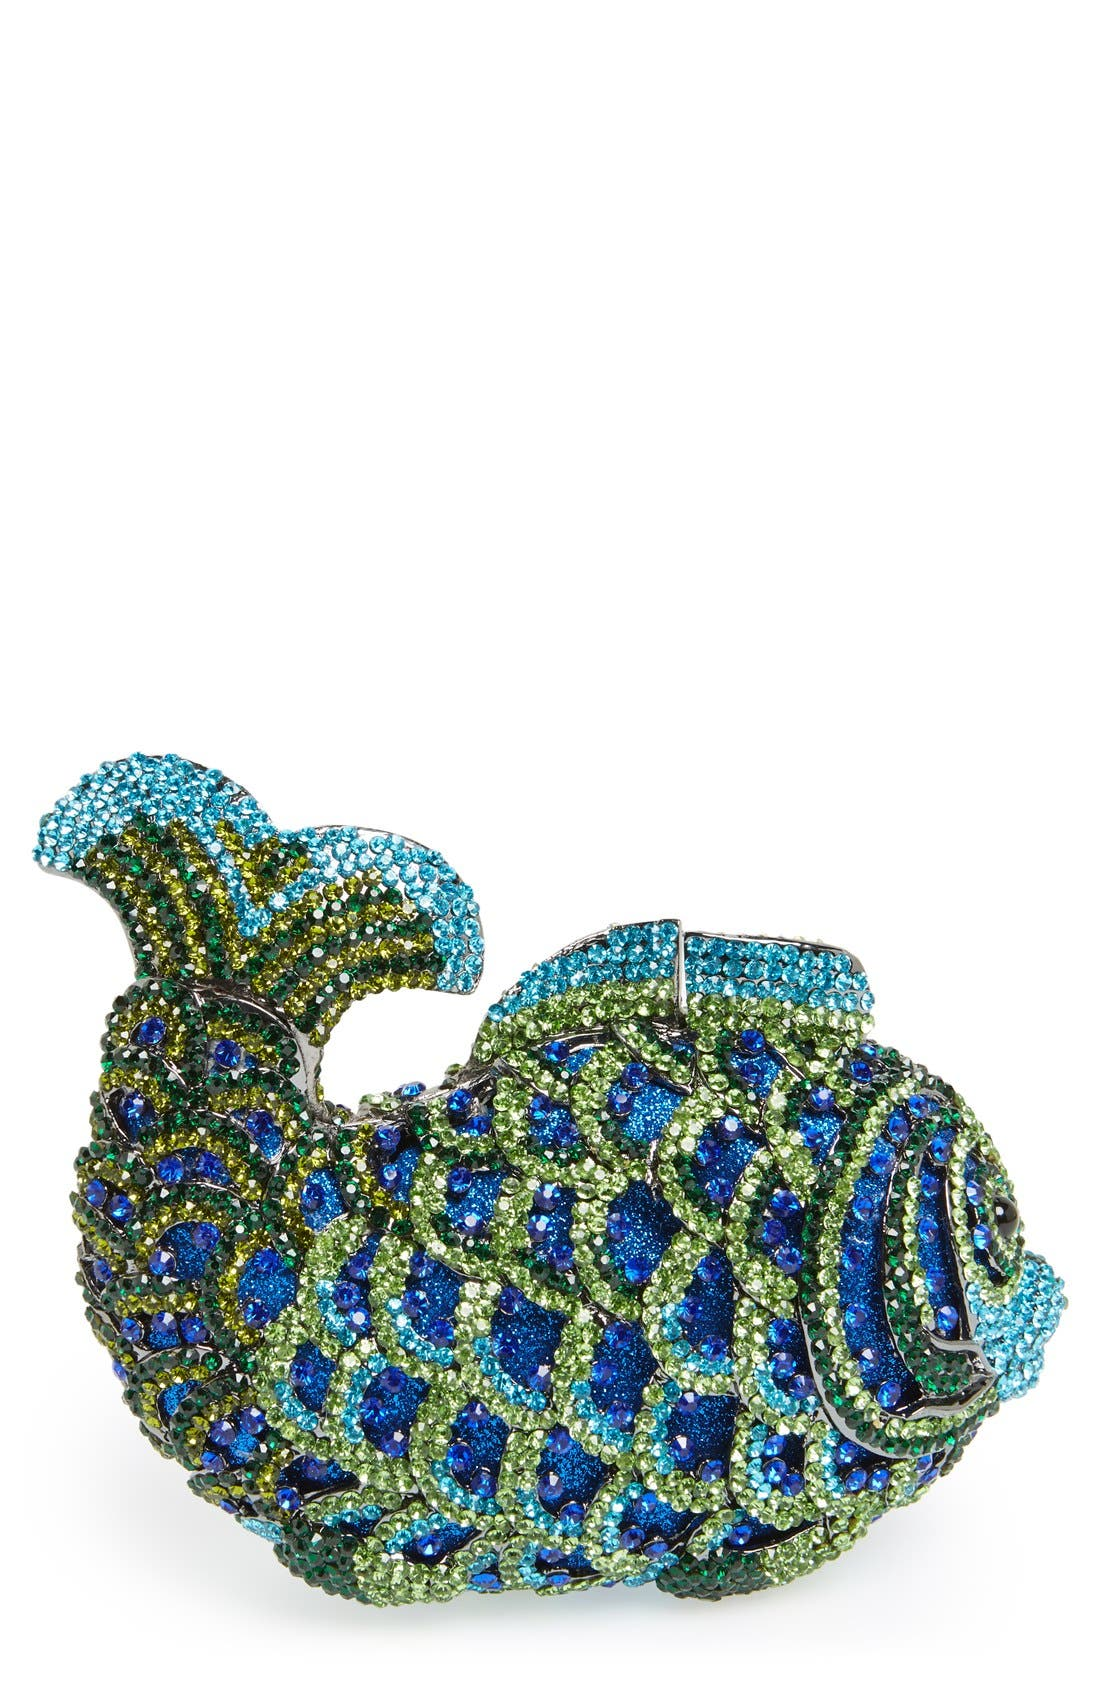 'Fish' Clutch,                             Main thumbnail 1, color,                             400